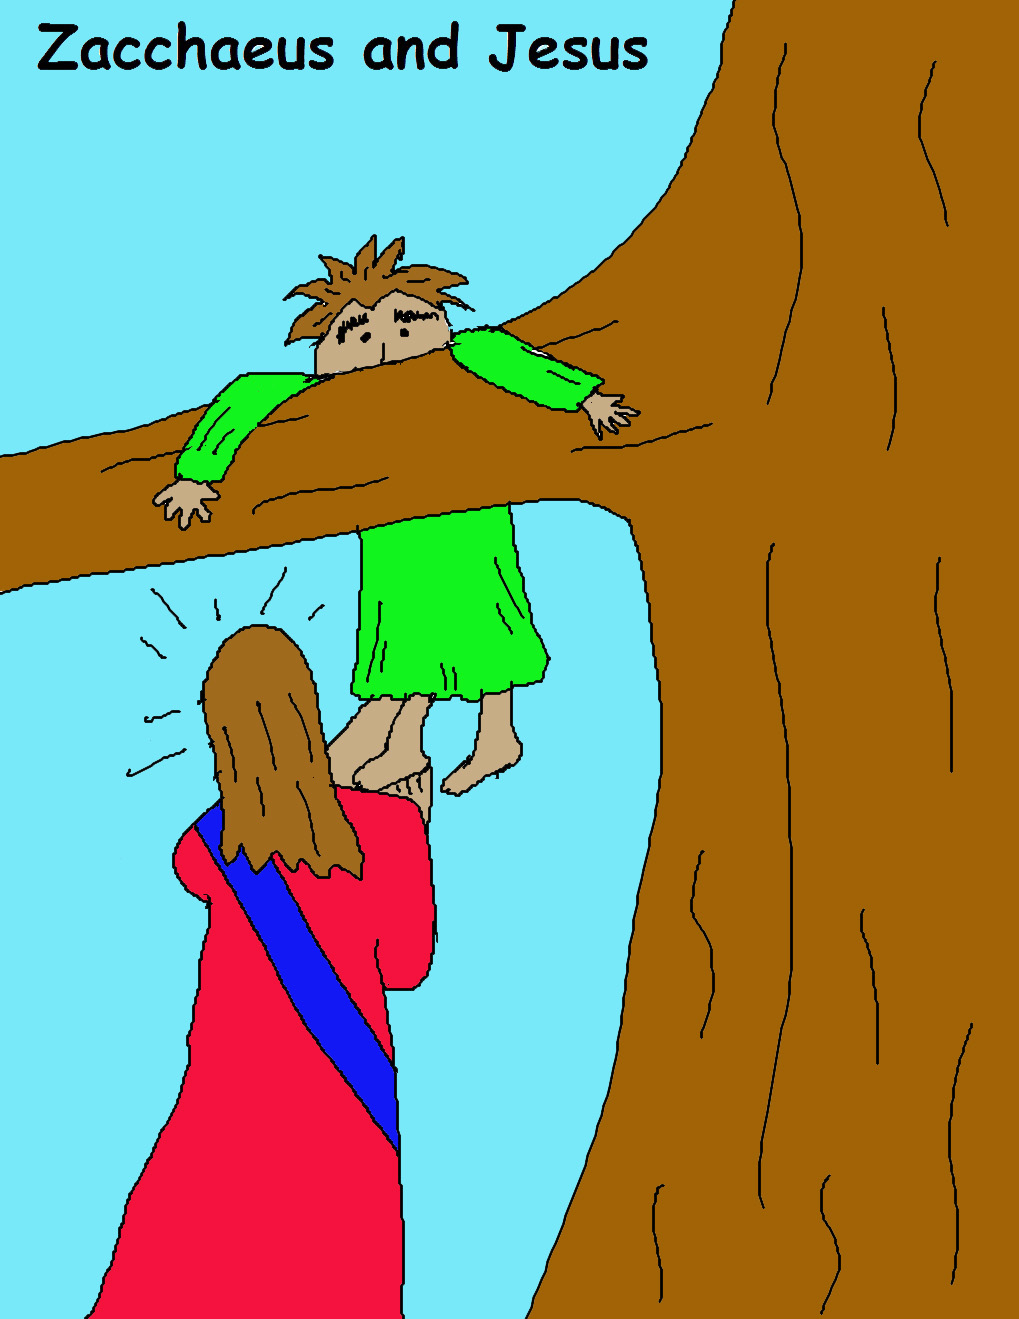 clipart jesus and zacchaeus - photo #3